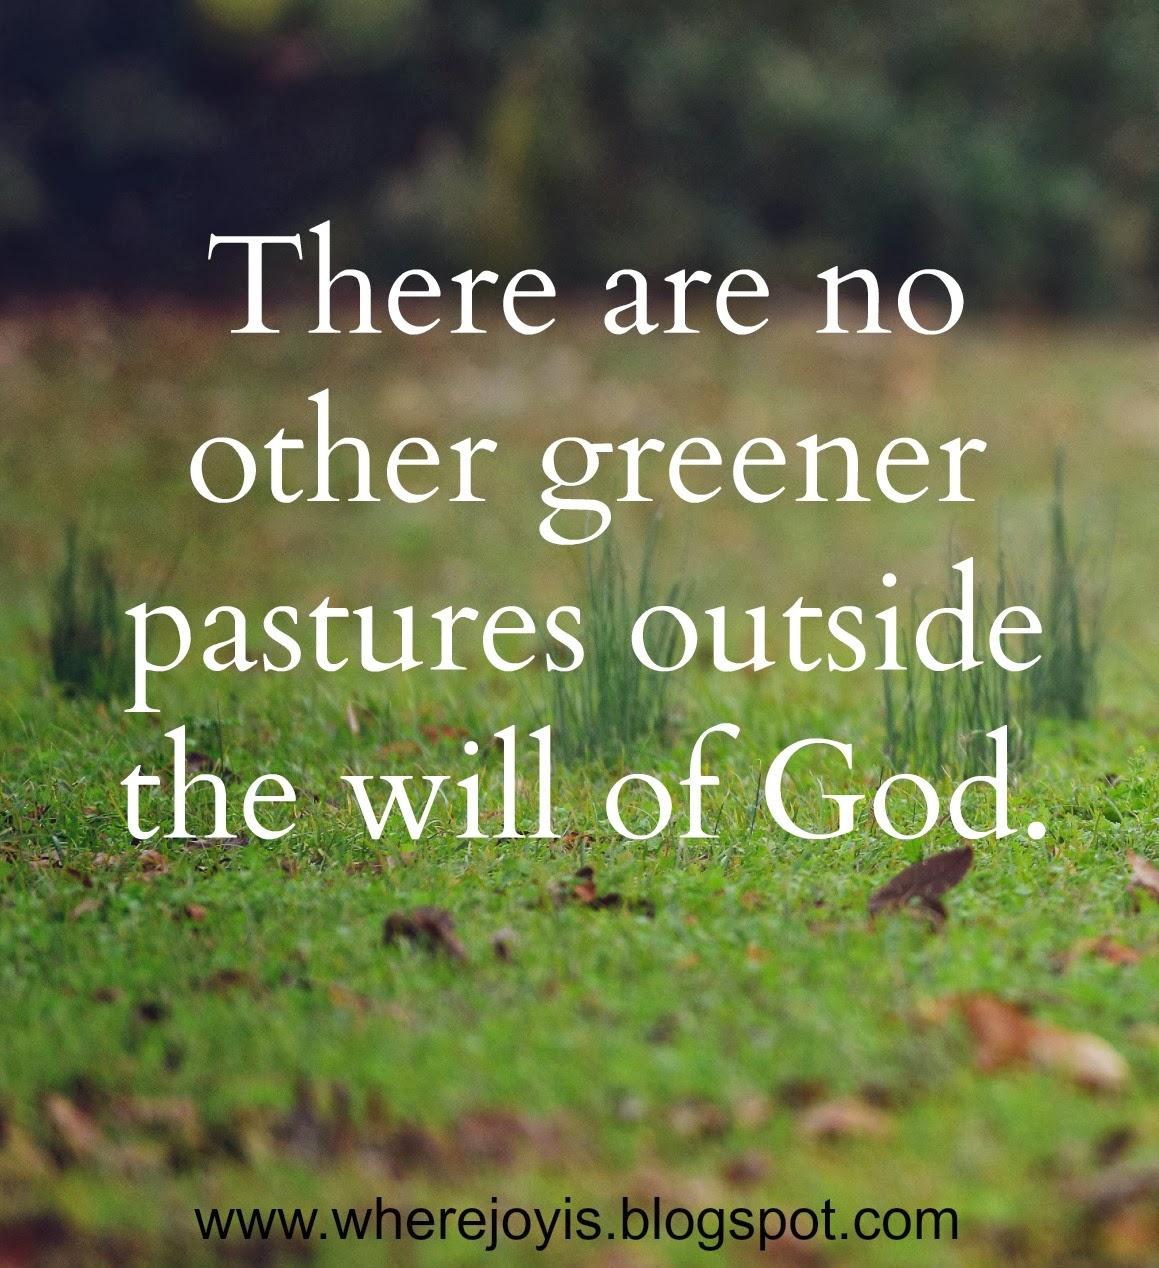 Go in search of greener pastures - Crossword clues ...